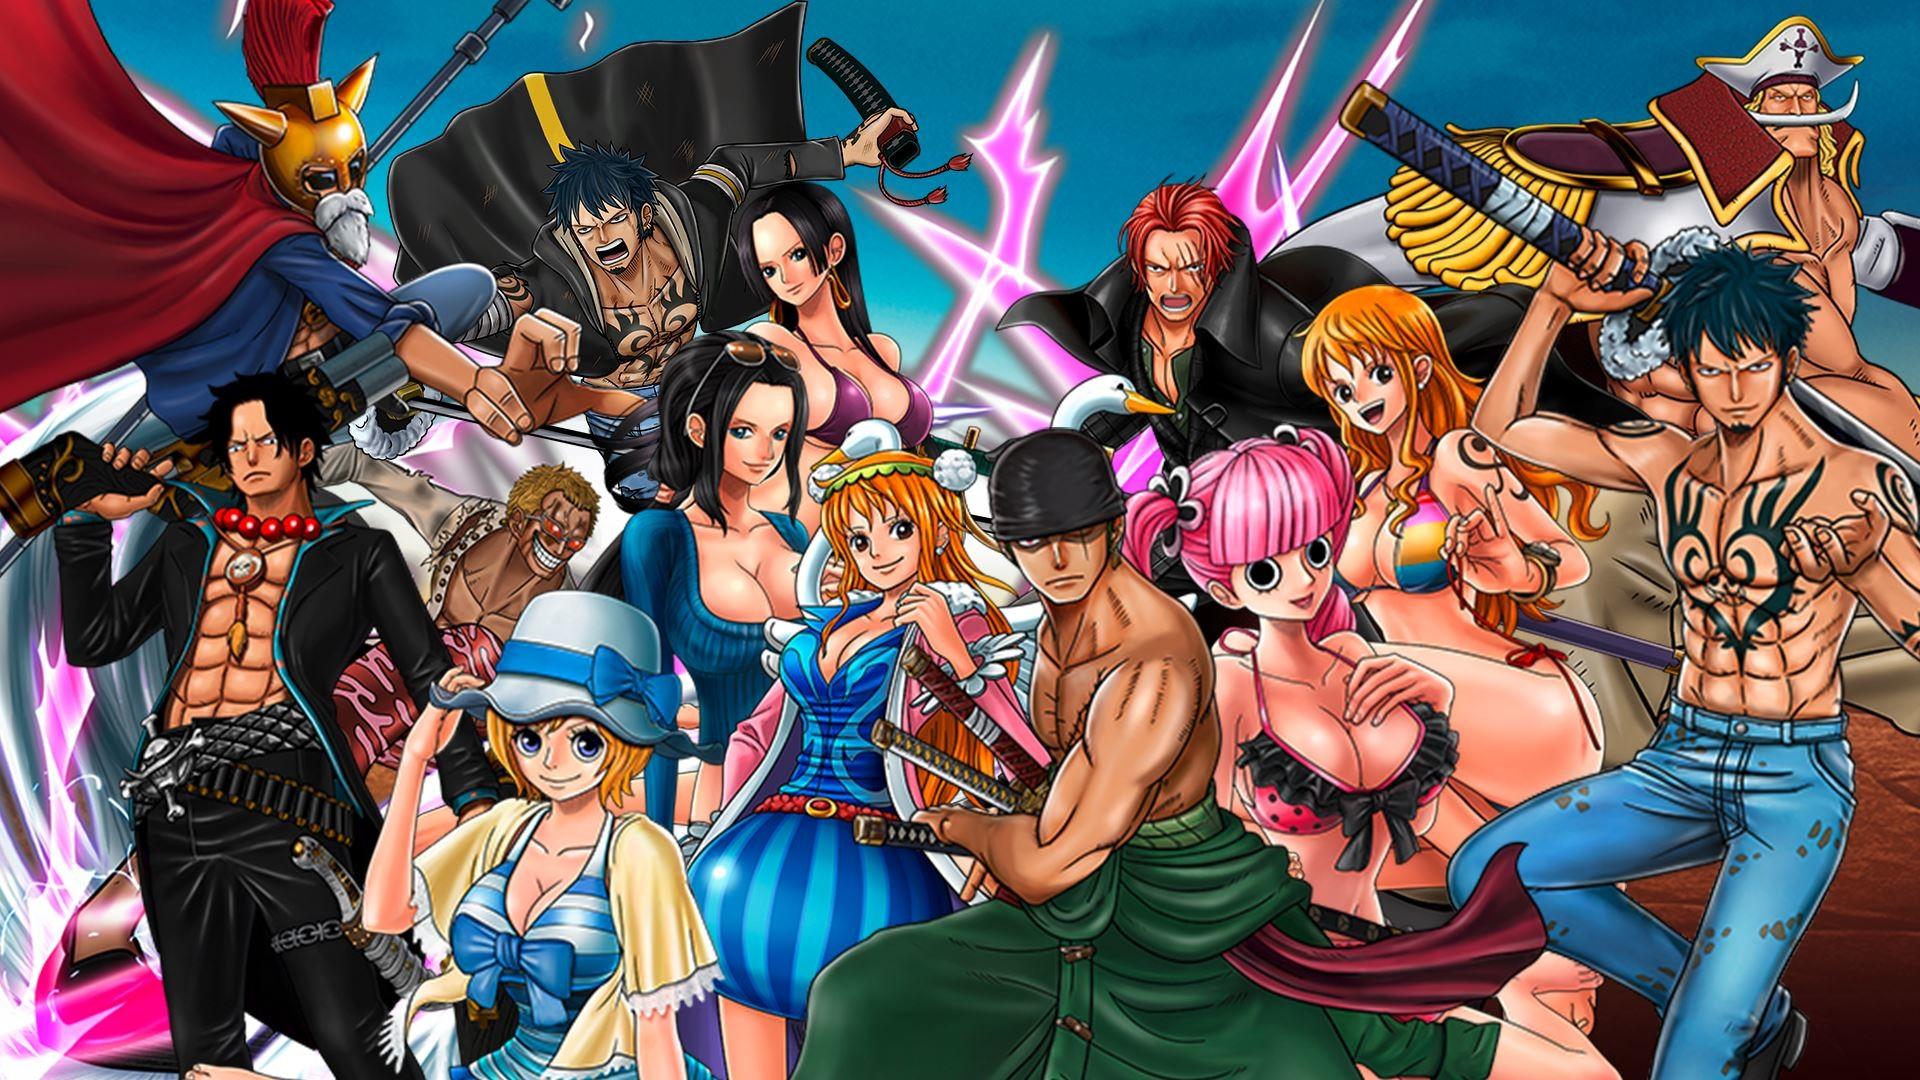 1080p One Piece Wallpaper Hd 4k Wallpaper Of Anime